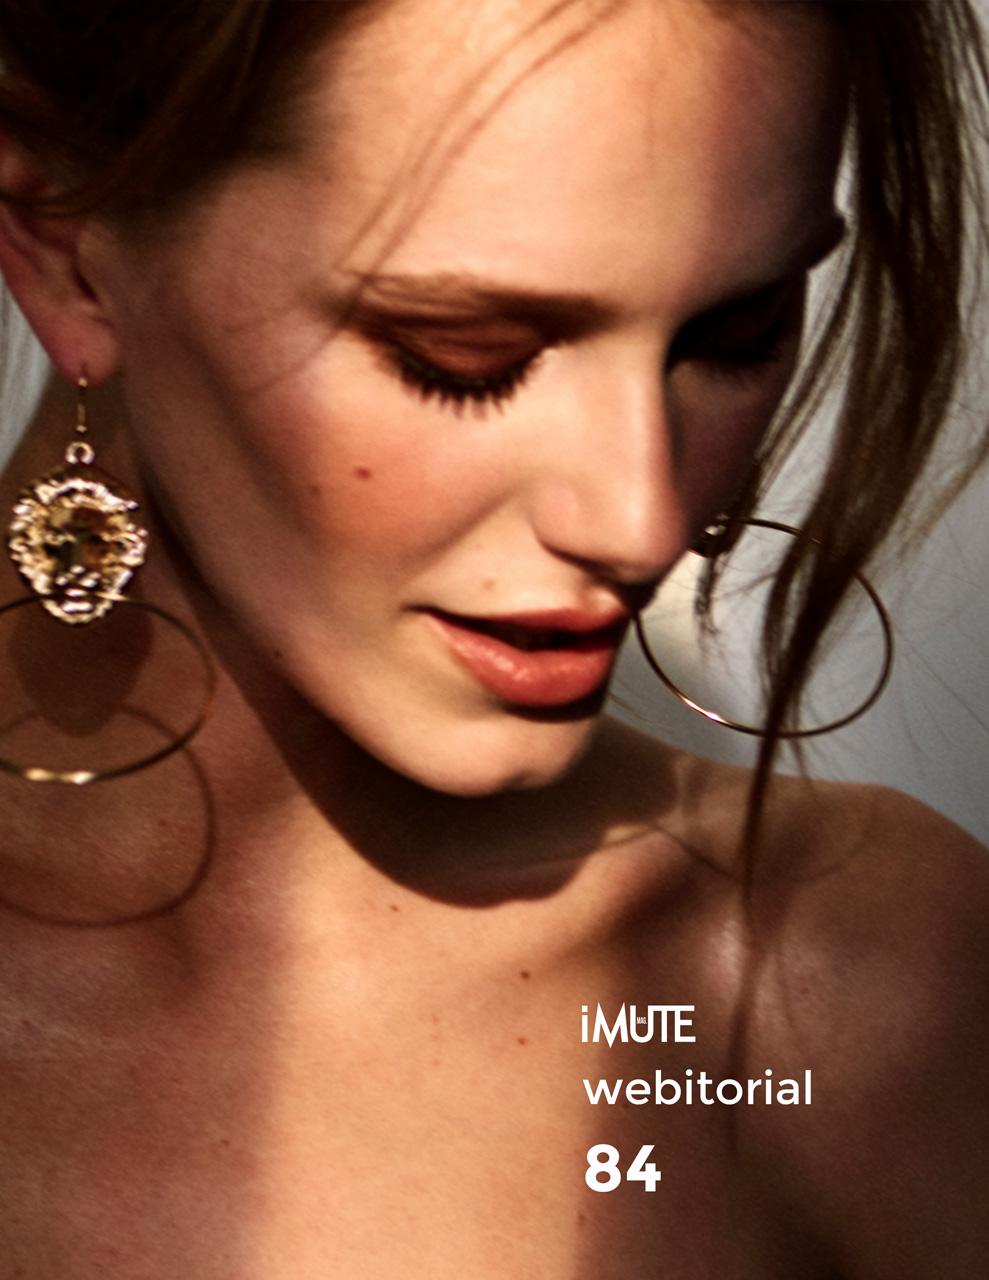 End Game webitorial for iMute Magazine Photographer   Hristo Hristov Model   Dariia Makarova @ PRM Model Agency Stylist   Aisha Paparella Makeup   Miranda Baron Hair   Tony Hristov